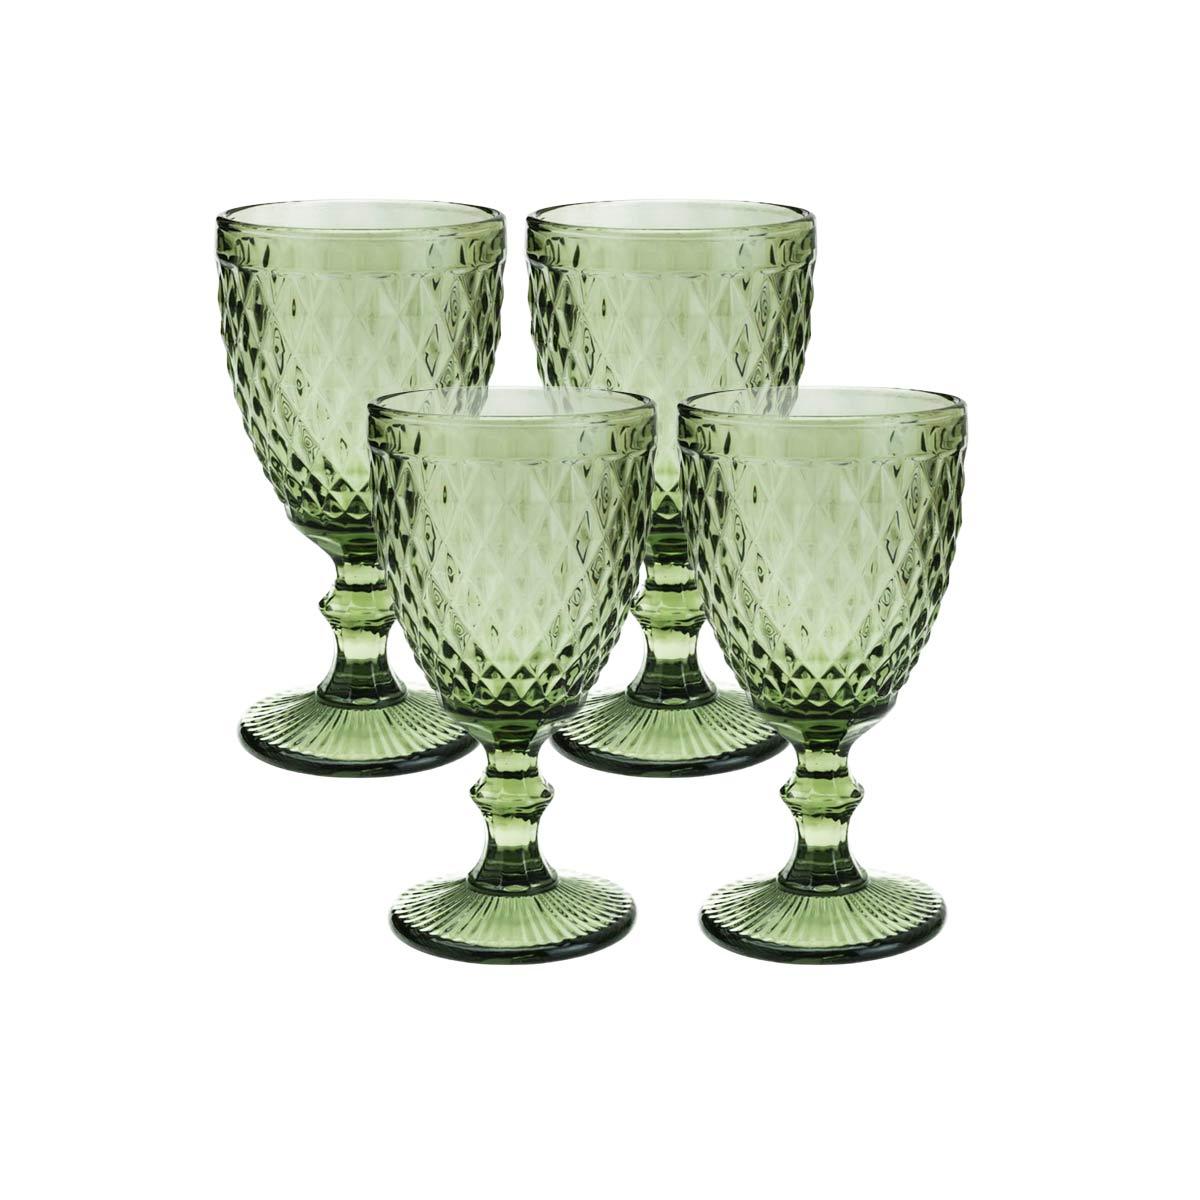 Jogo 4 Taças de Vidro p/Água Lyor Abacaxi 325 ml Verde  - Lemis